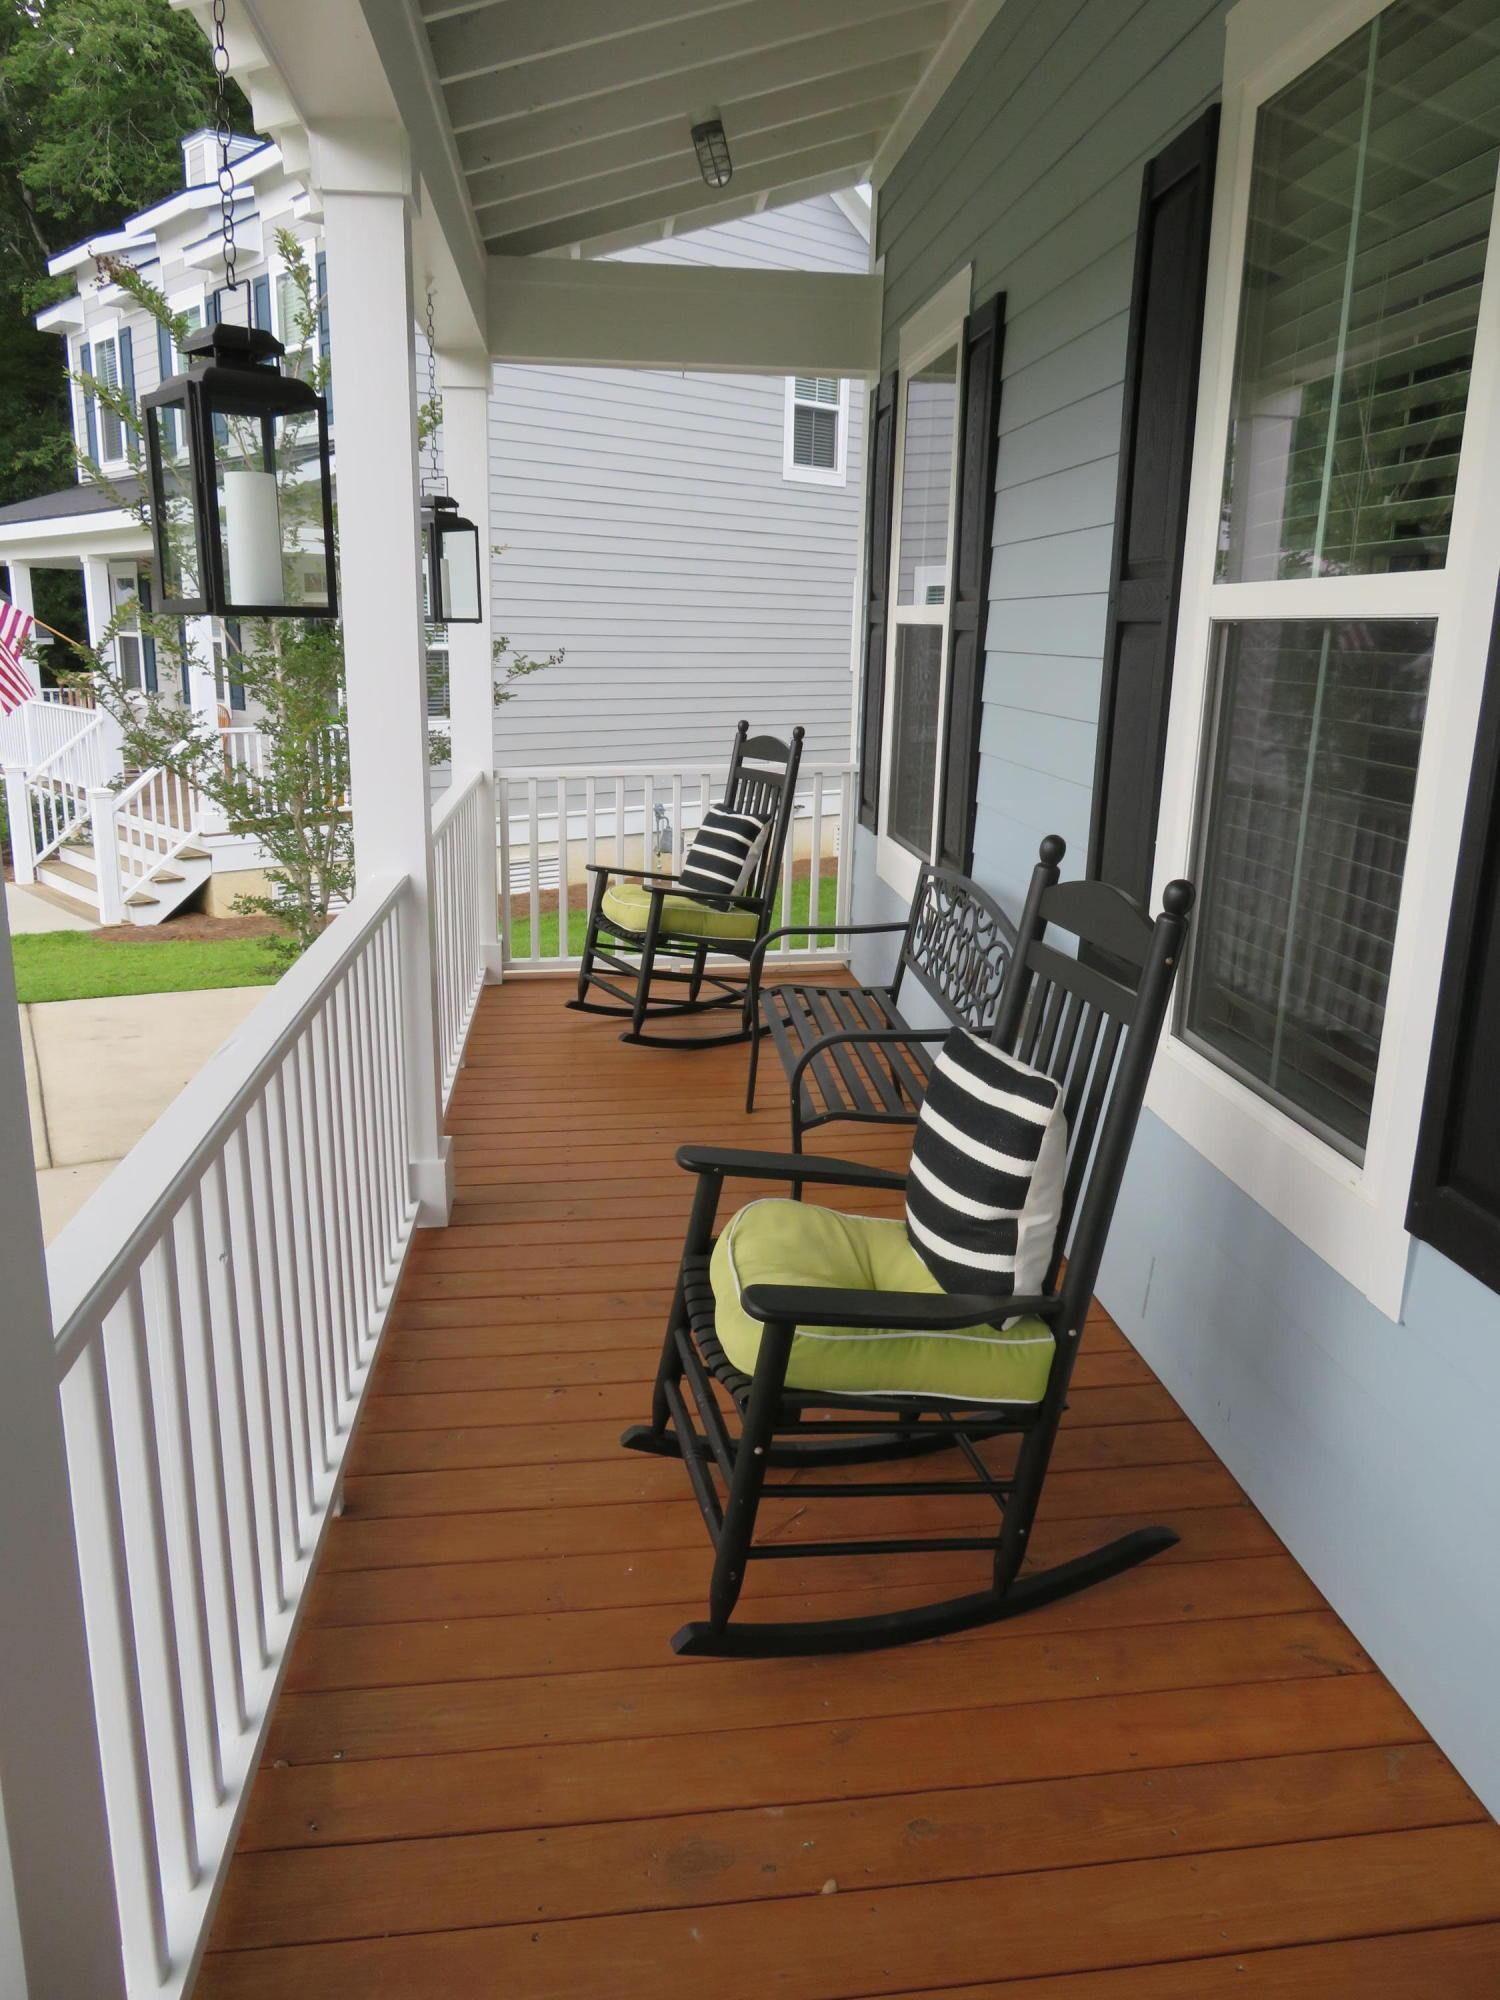 Hillside Farms Homes For Sale - 114 Danielle, Summerville, SC - 38